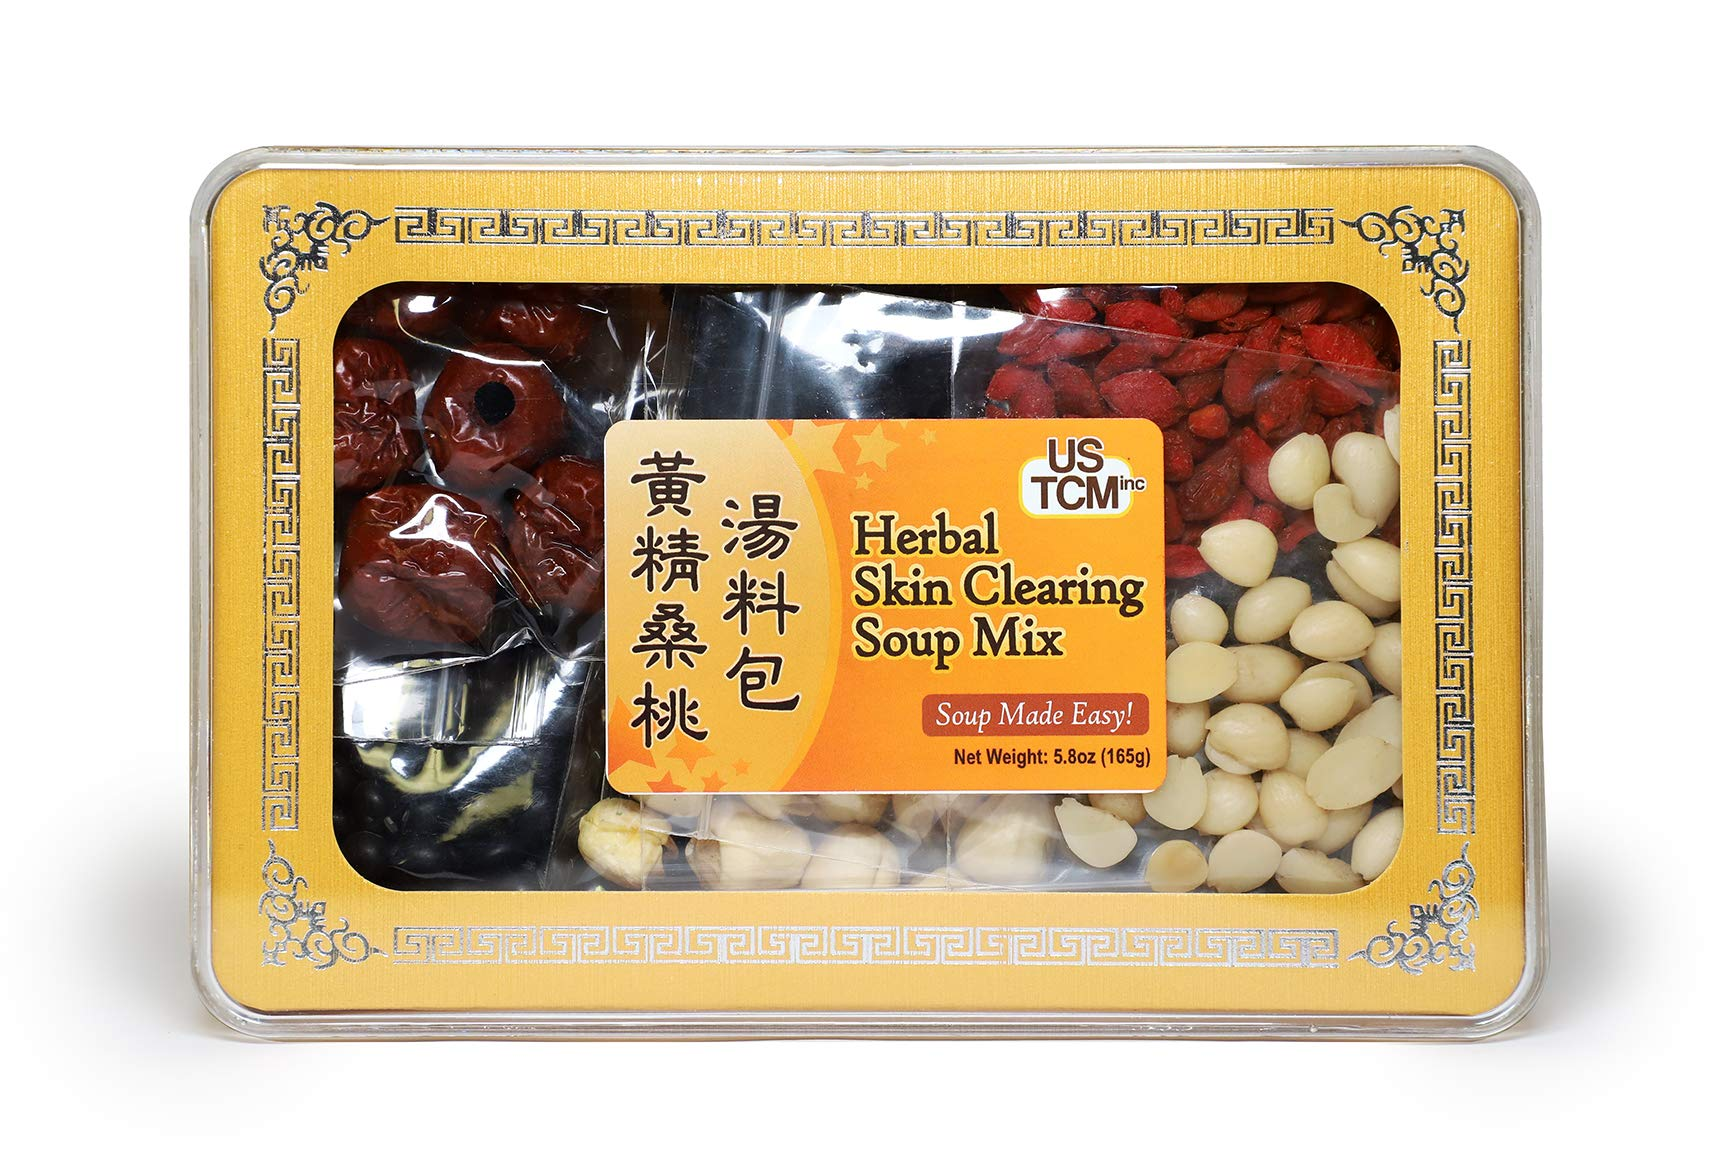 Herbal Fresh Skin Soup Mix Soup Base 黃精桑桃湯料包 Soup Made Easy! 3-4 Servings 5.8oz